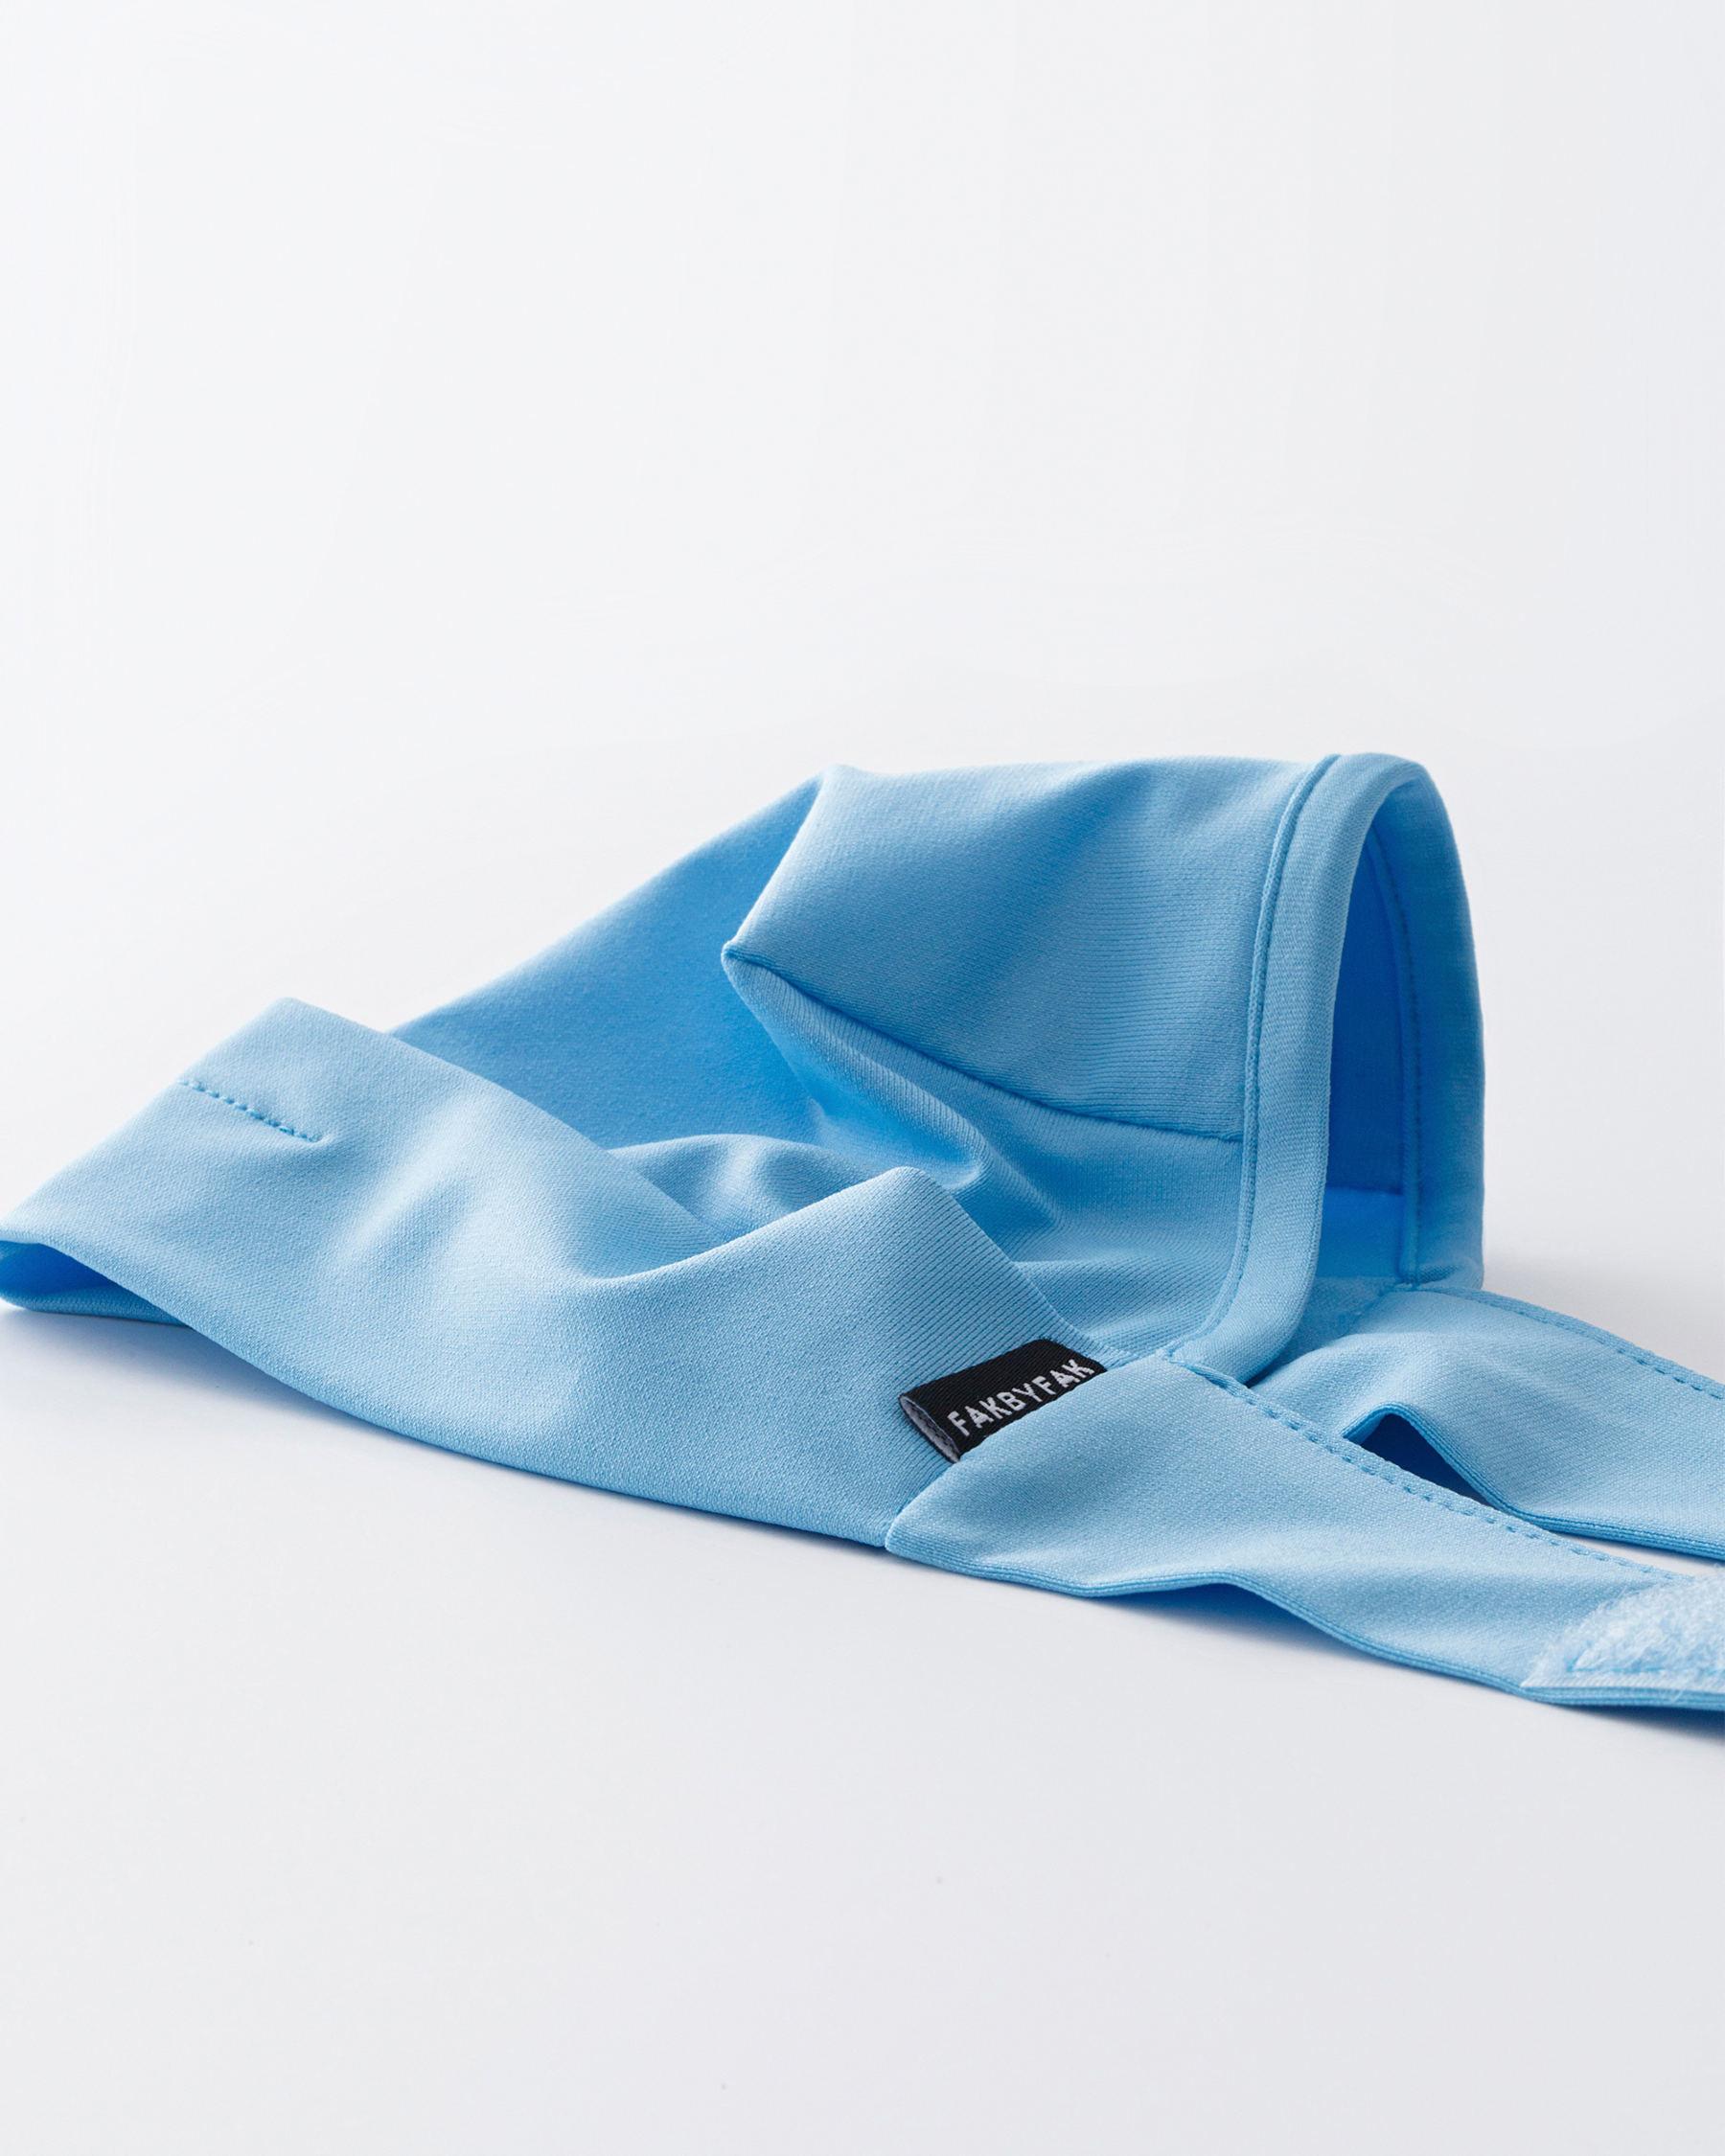 FAKBYFAK  The Vega. Ear Strap-Free High-End Protective Antibacterial (ATB-UV+) Face Mask. Light Blue Code: FBF-42101-05